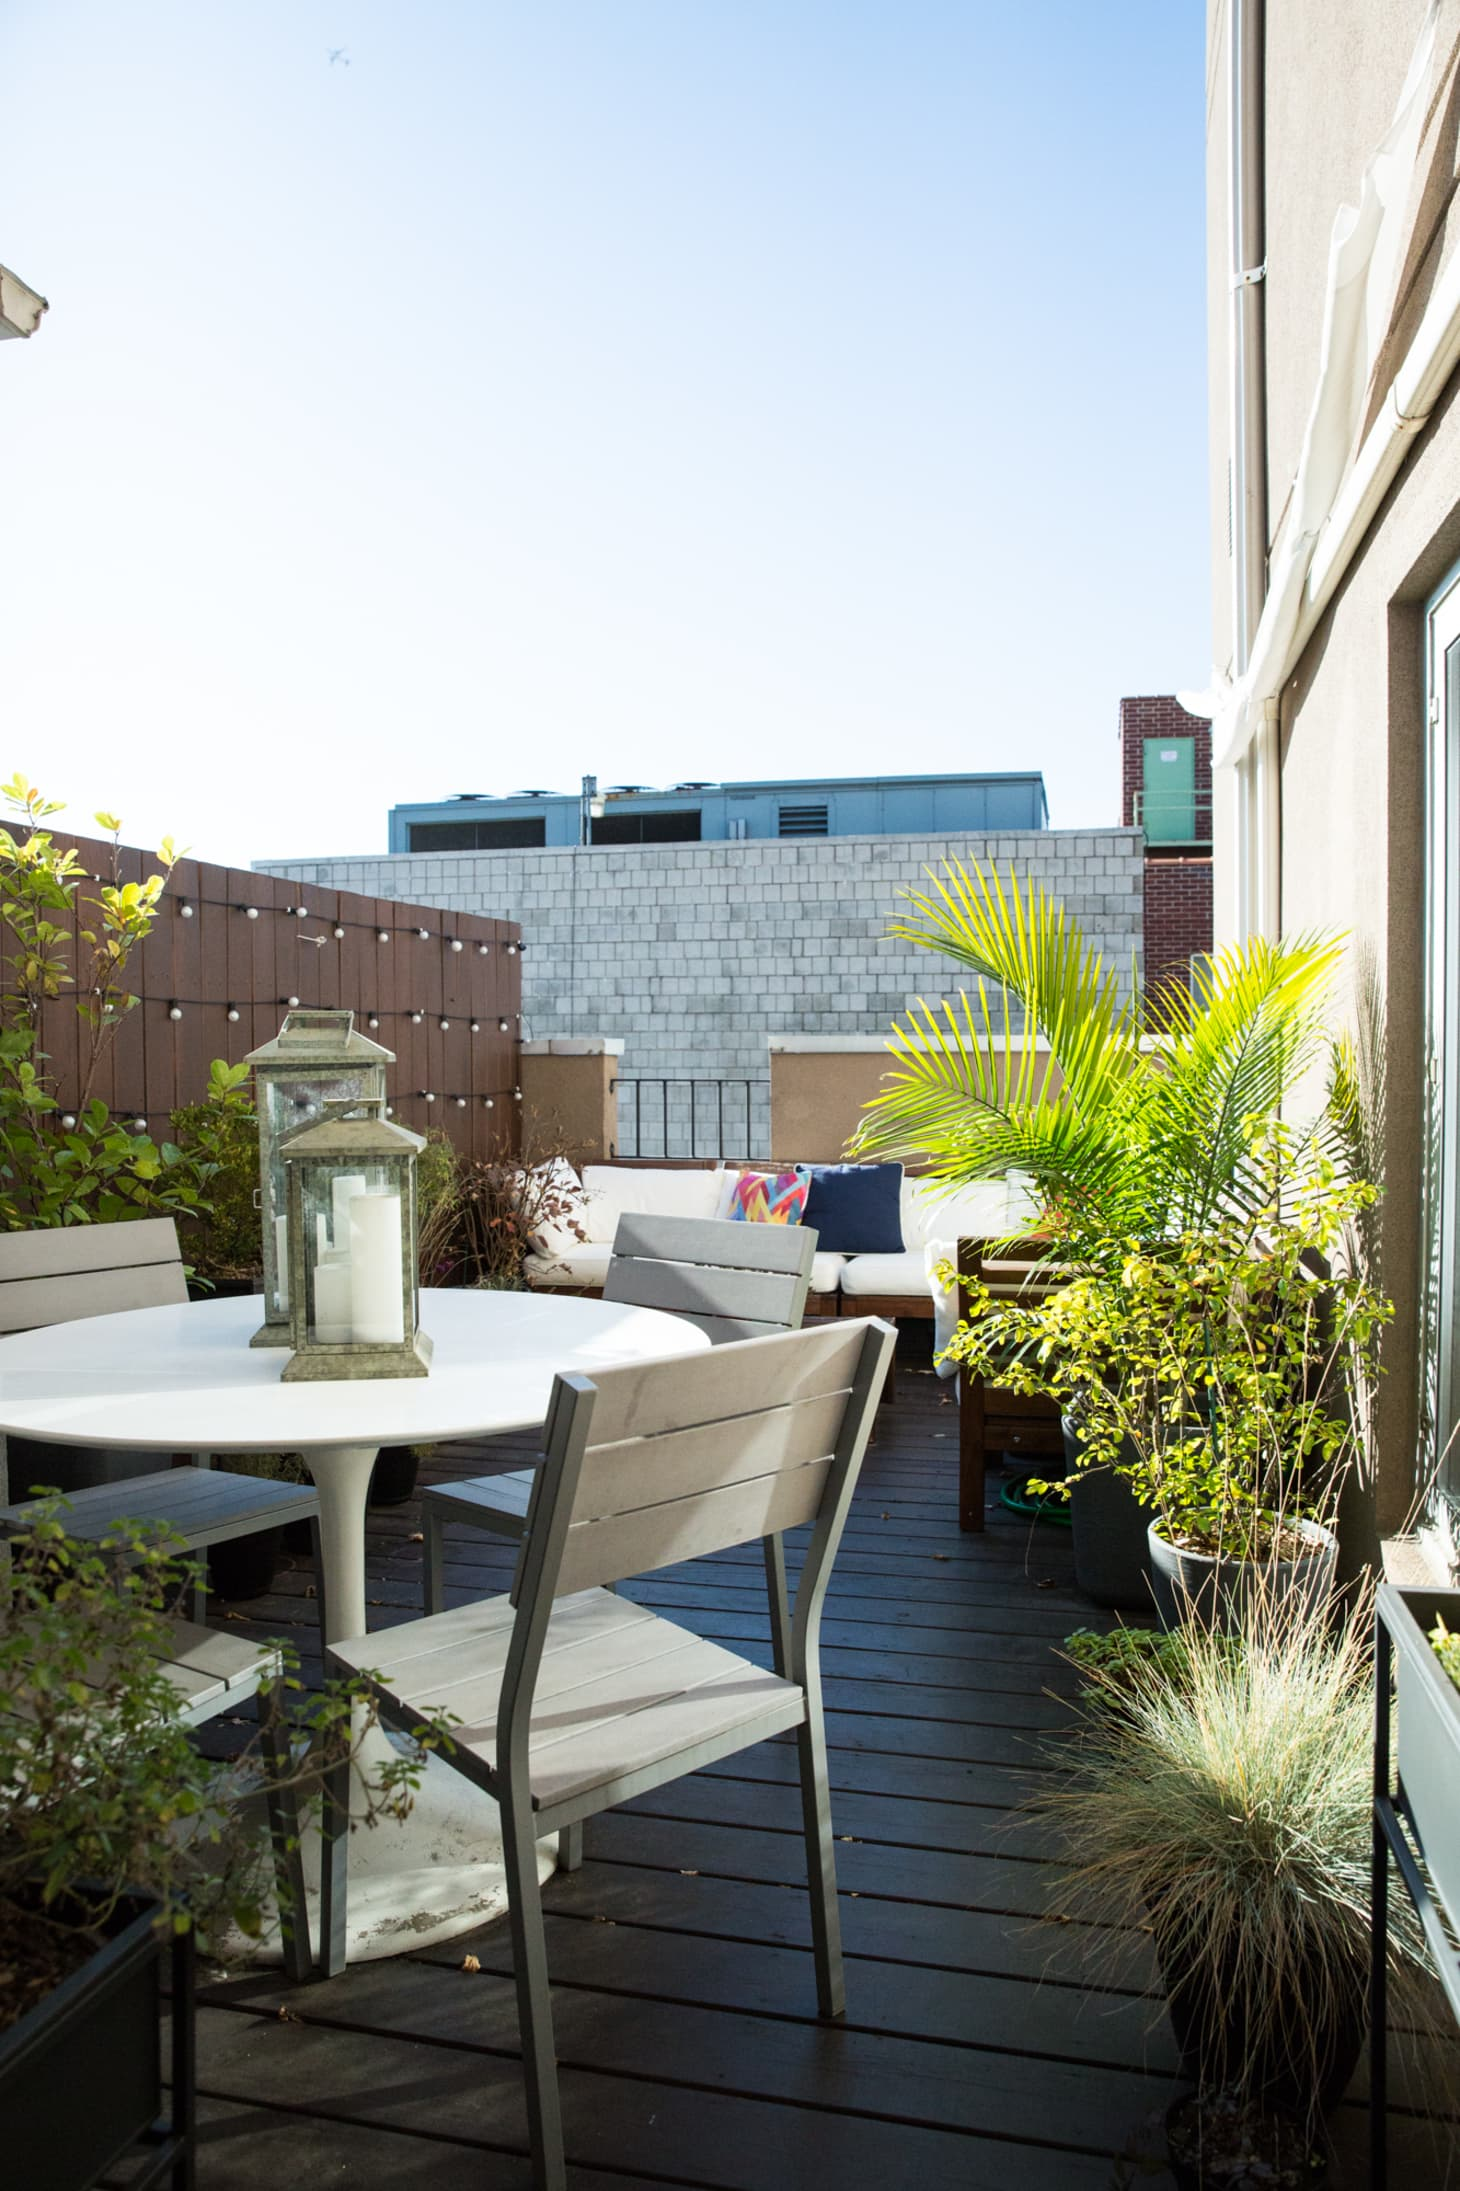 20 Fun Balcony Ideas - How to Decorate a Small Balcony ...